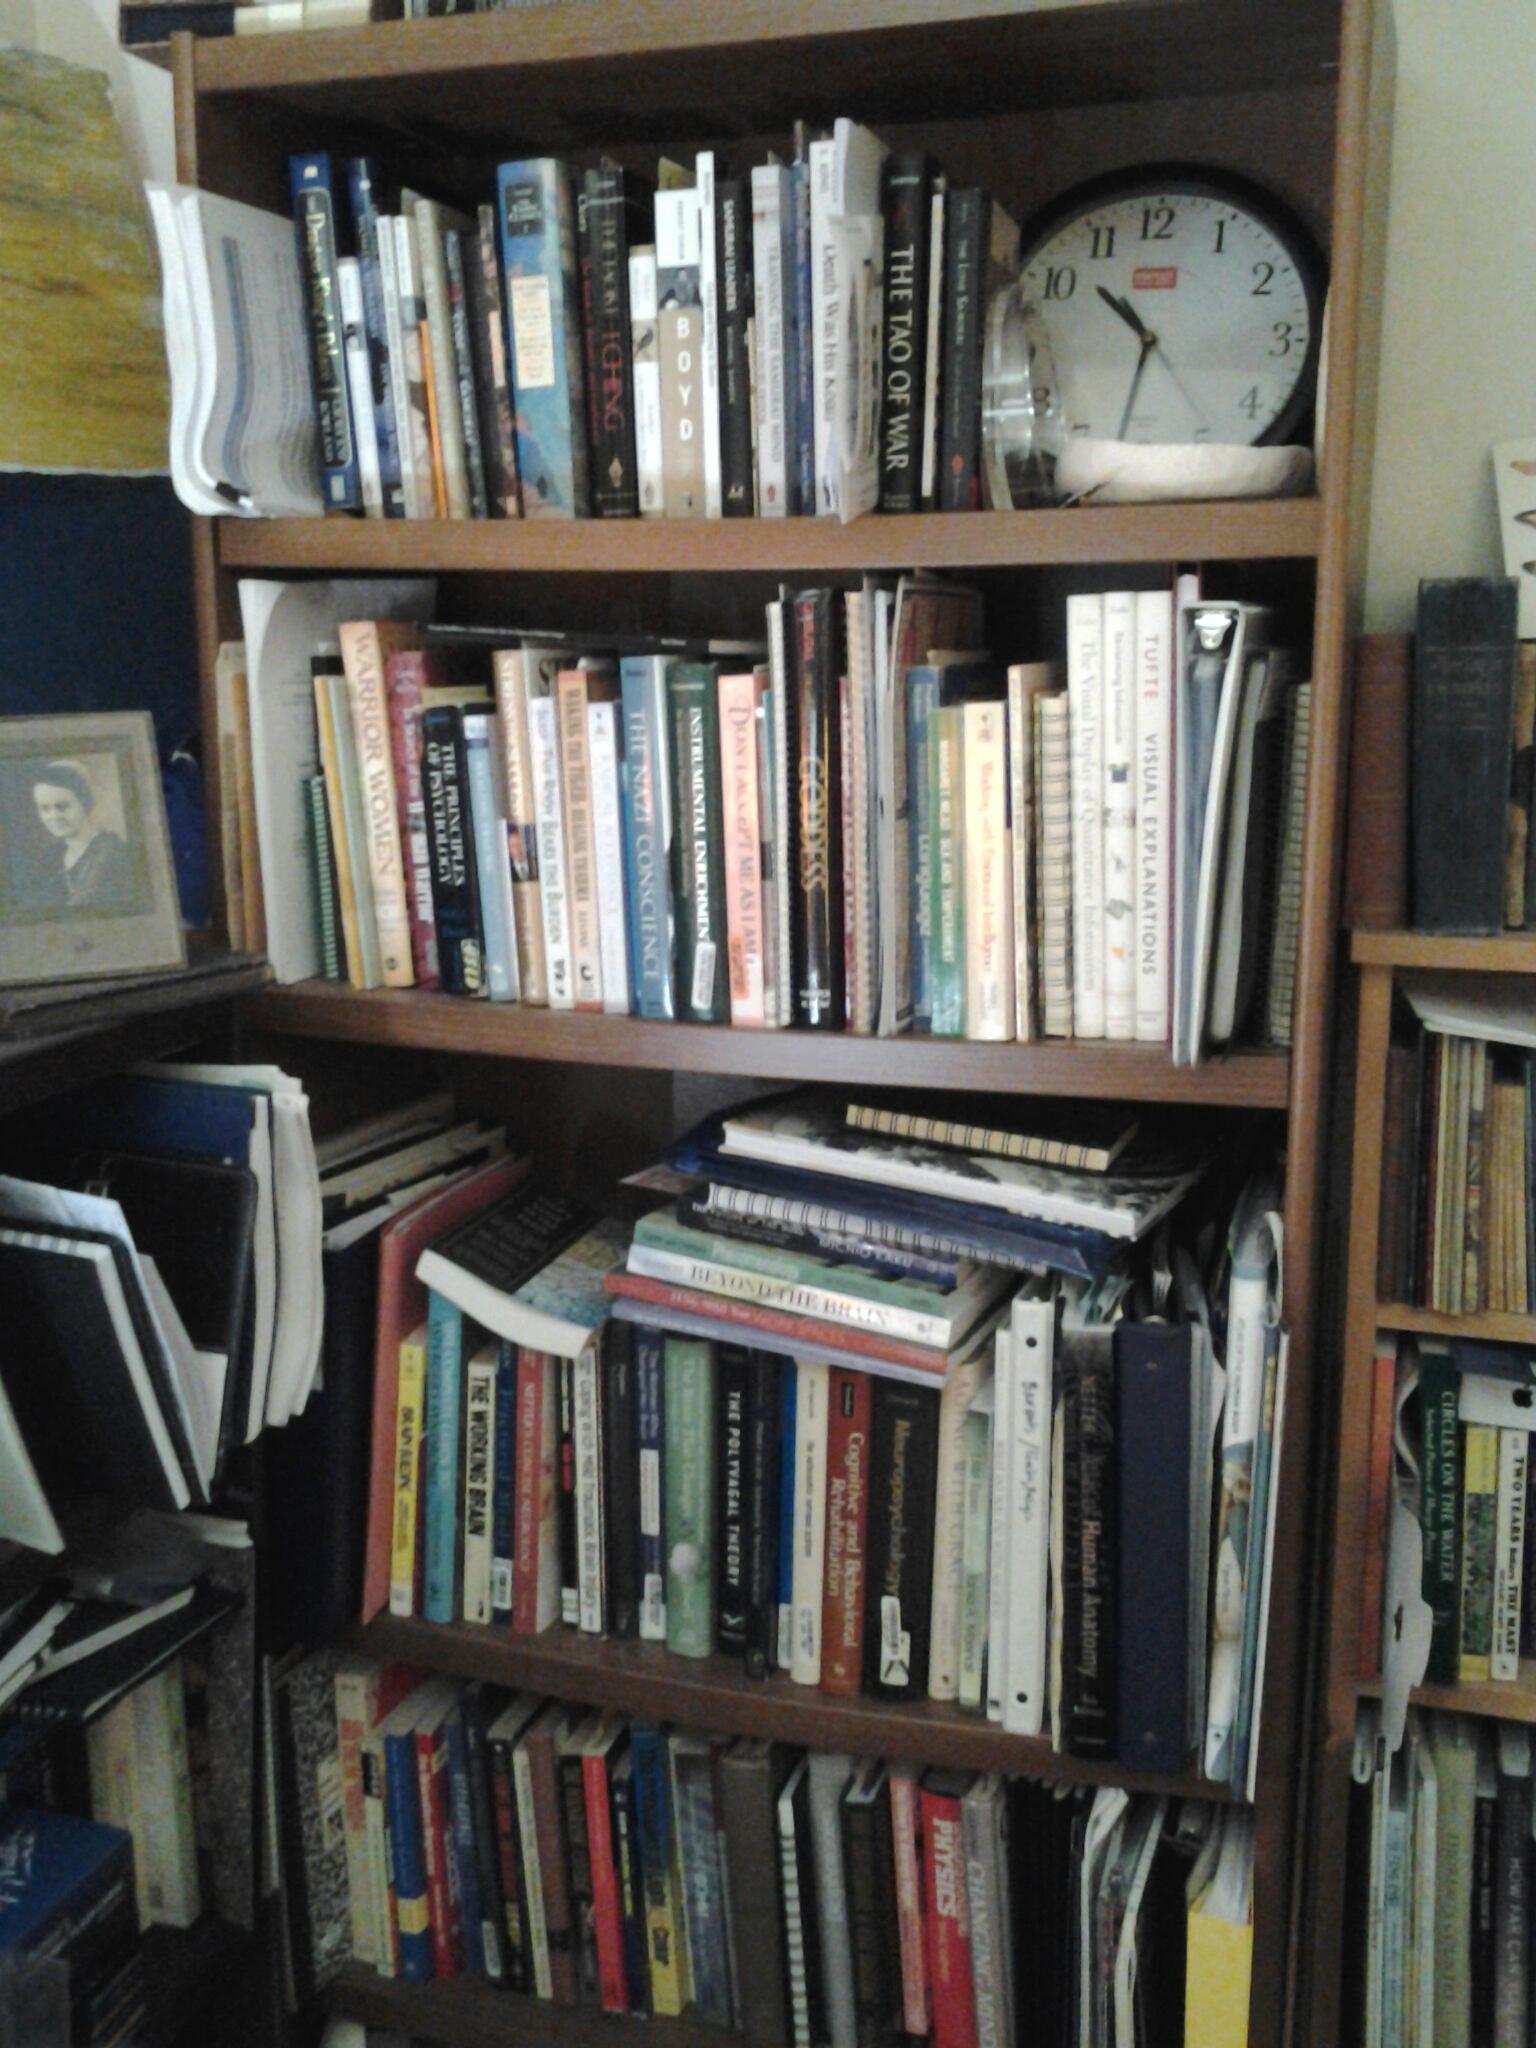 Bookshelf 2 - Neurology, Psychology, Zen, War, Physics